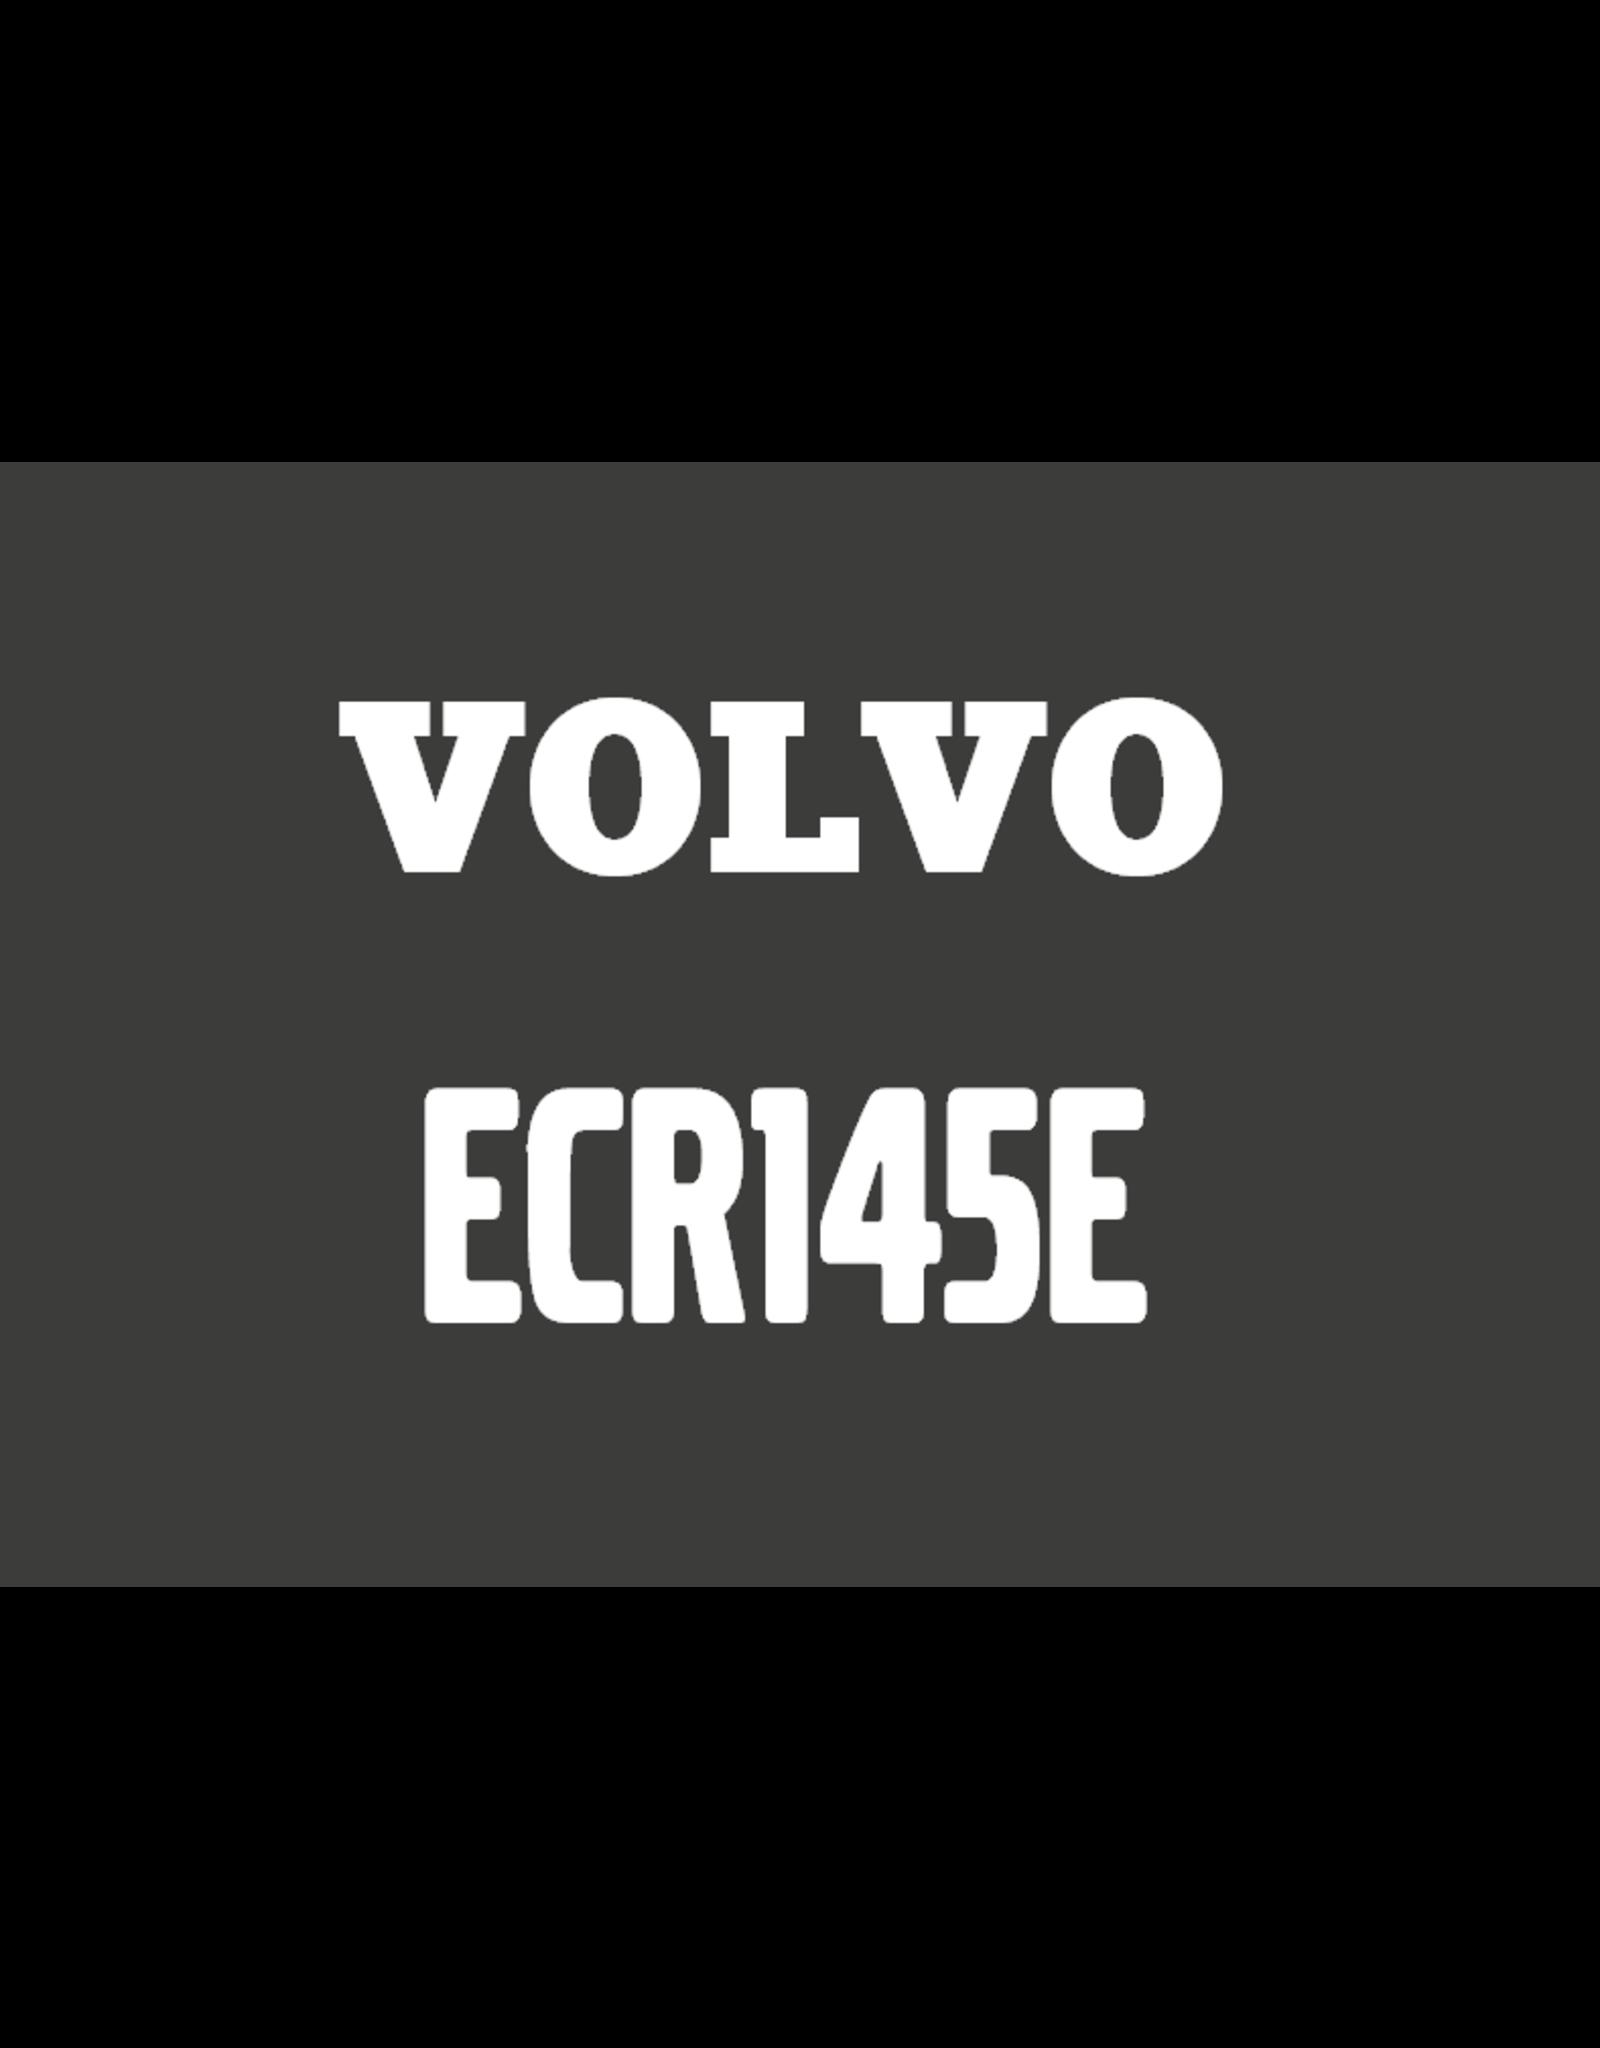 Echle Hartstahl GmbH FOPS pour Volvo ECR145E